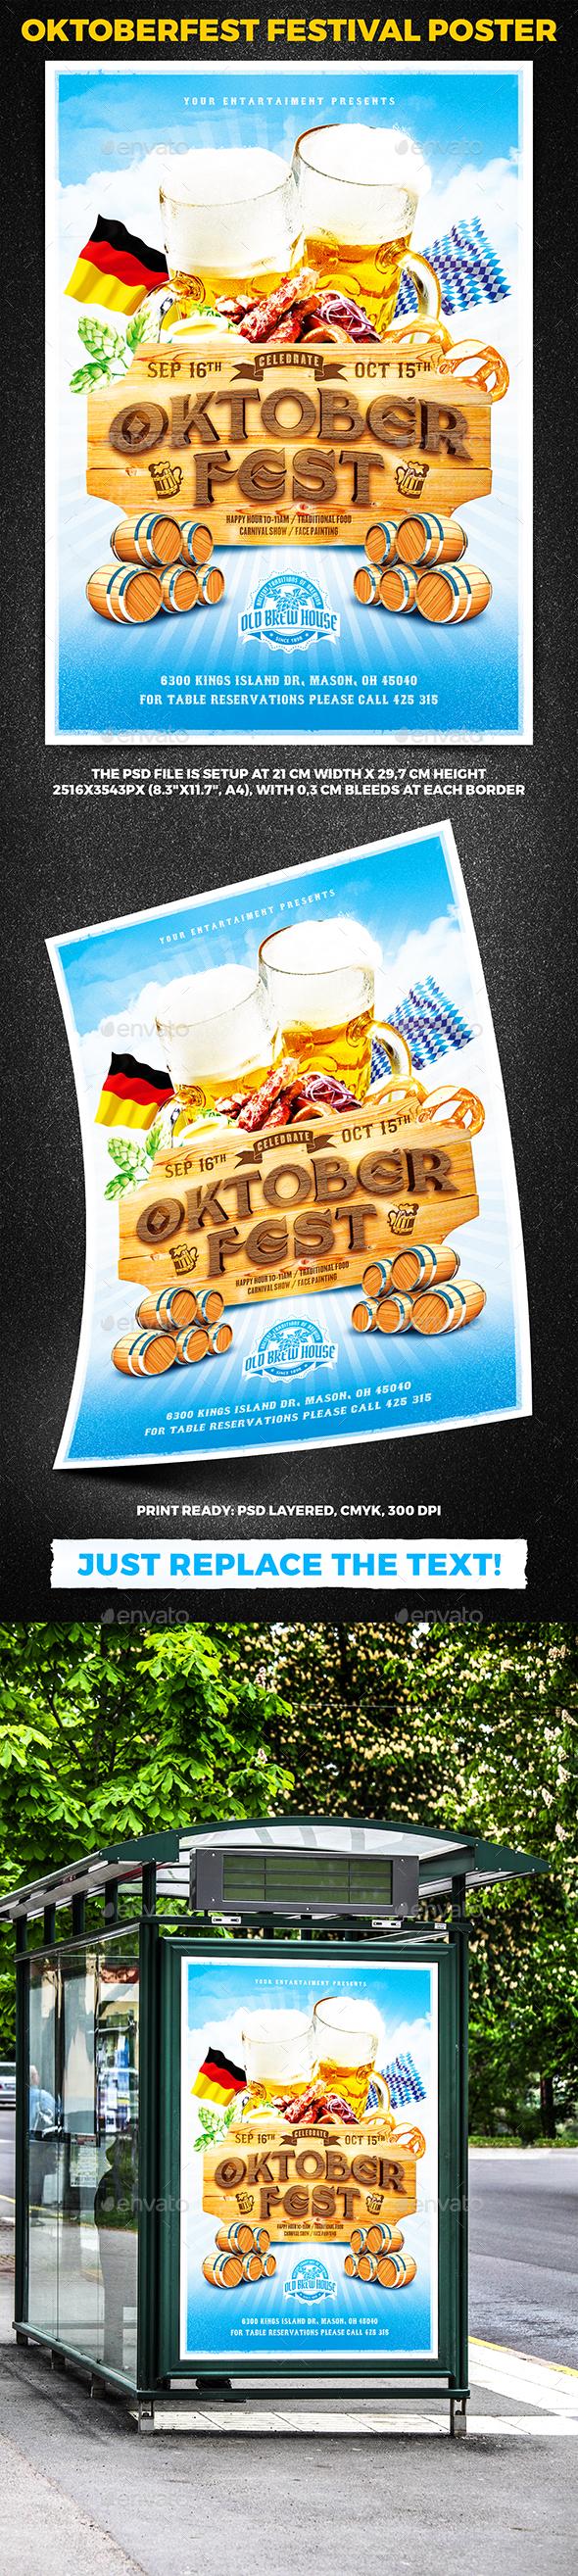 Oktoberfest Festival Poster vol.8